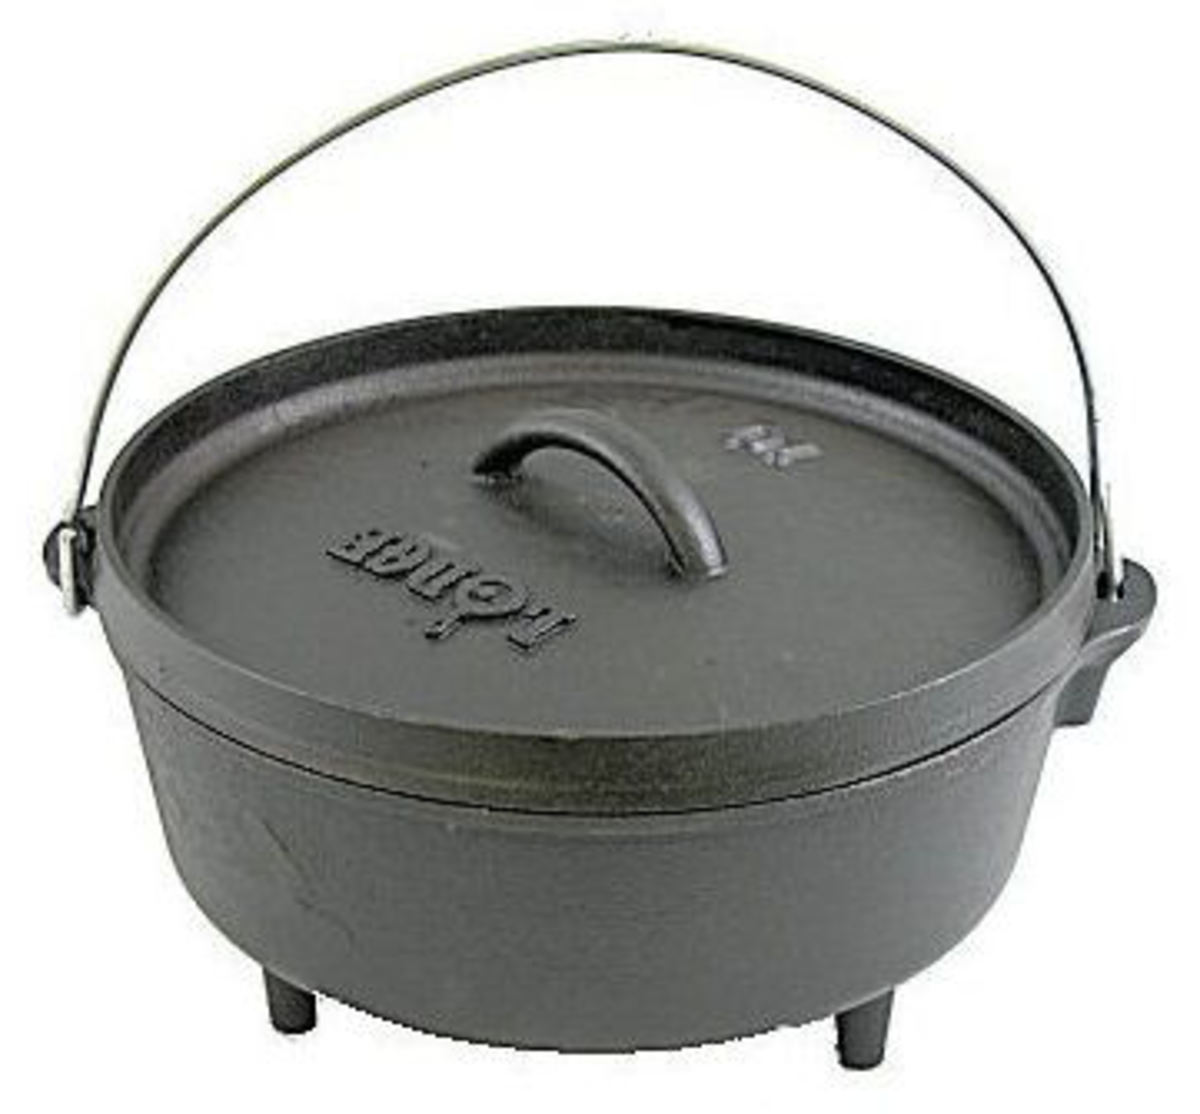 The Lodge 8 qt. Cast Iron Dutch Oven